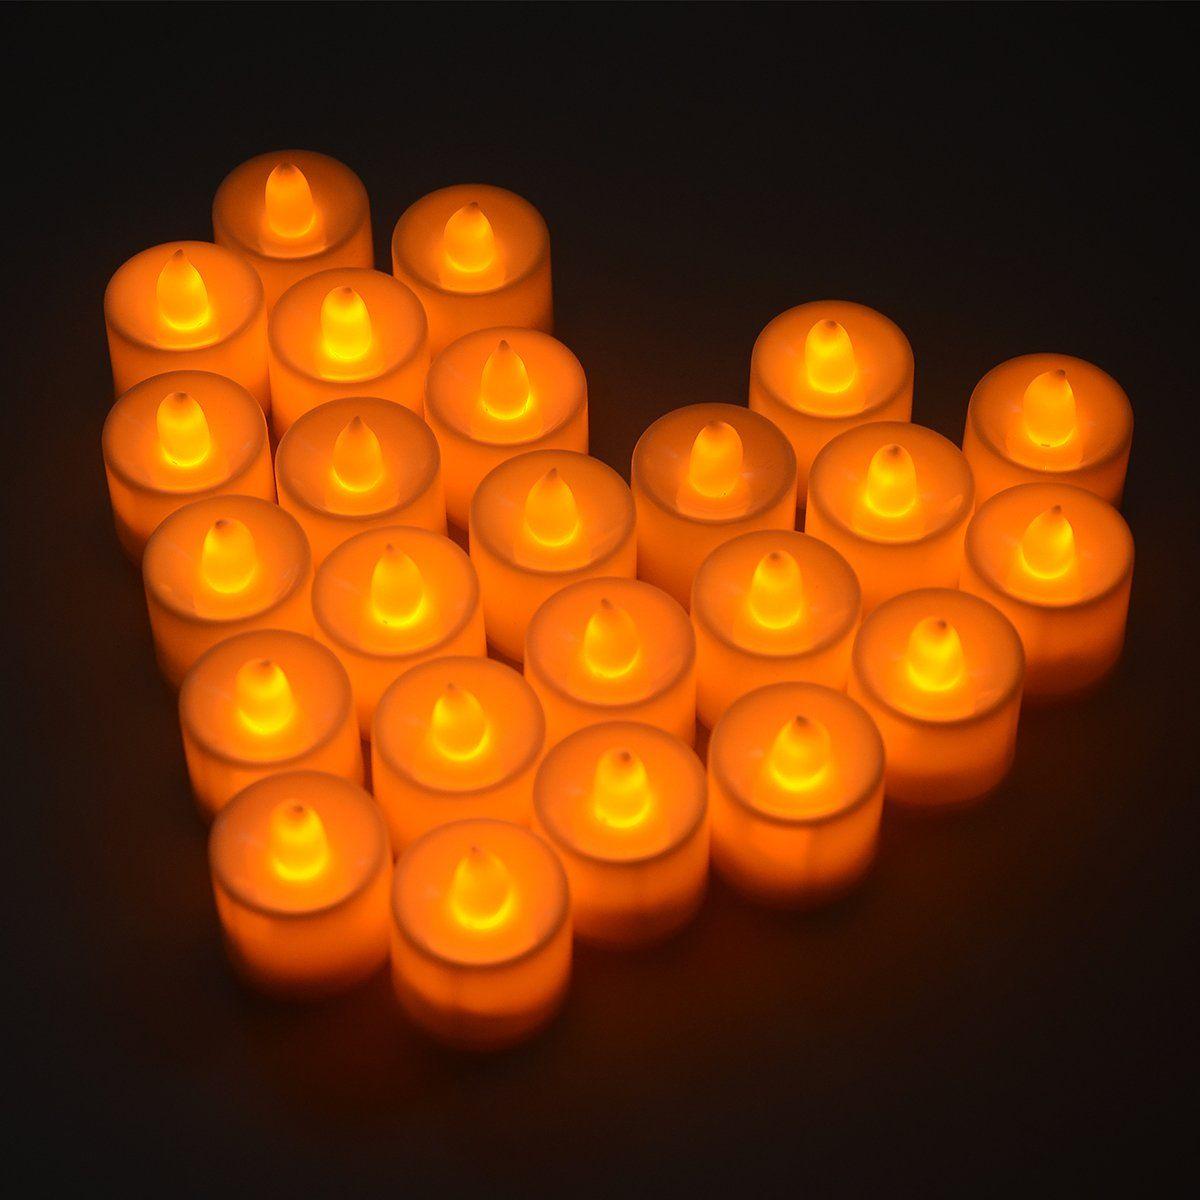 Set of Flickering Flameless LED Candle Light Tea light Amber